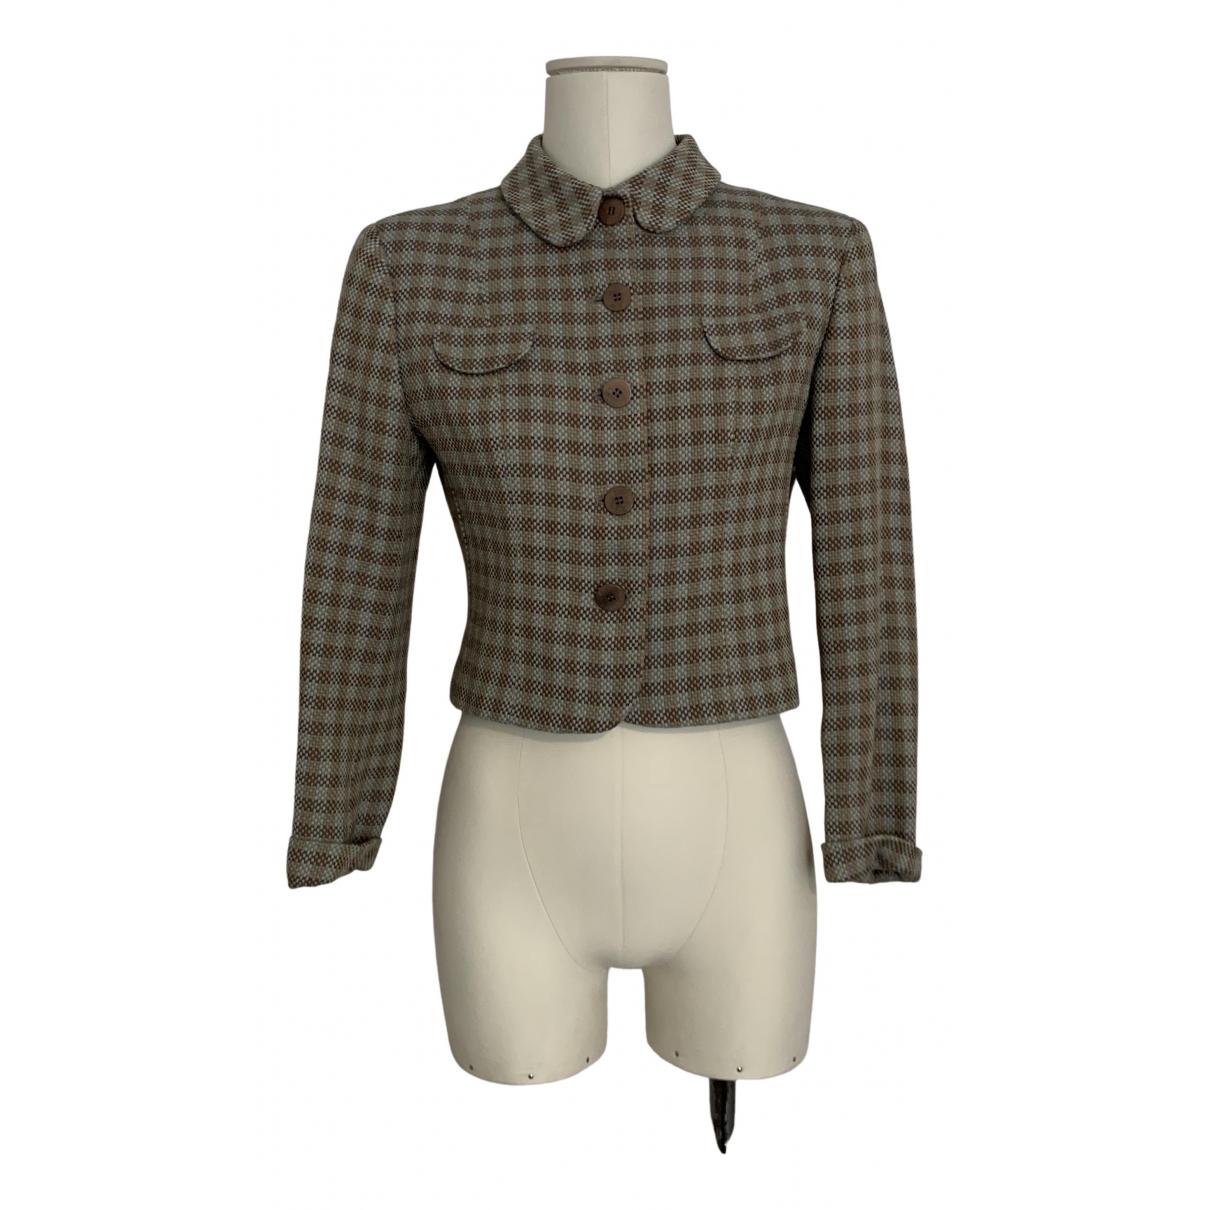 Giorgio Armani - Veste   pour femme en laine - multicolore